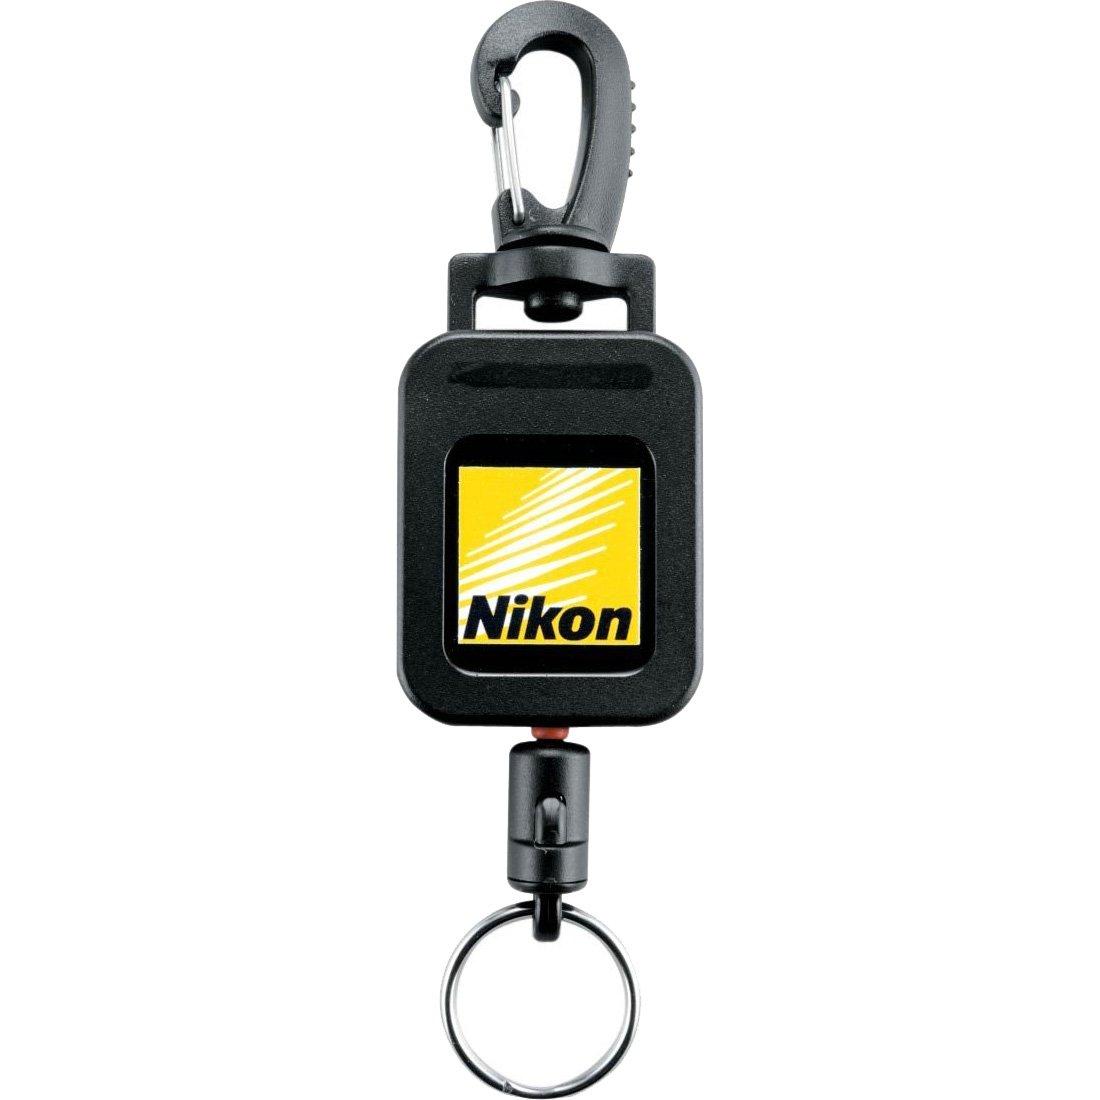 Nikon 8172 Retractable Rangefinder Tether